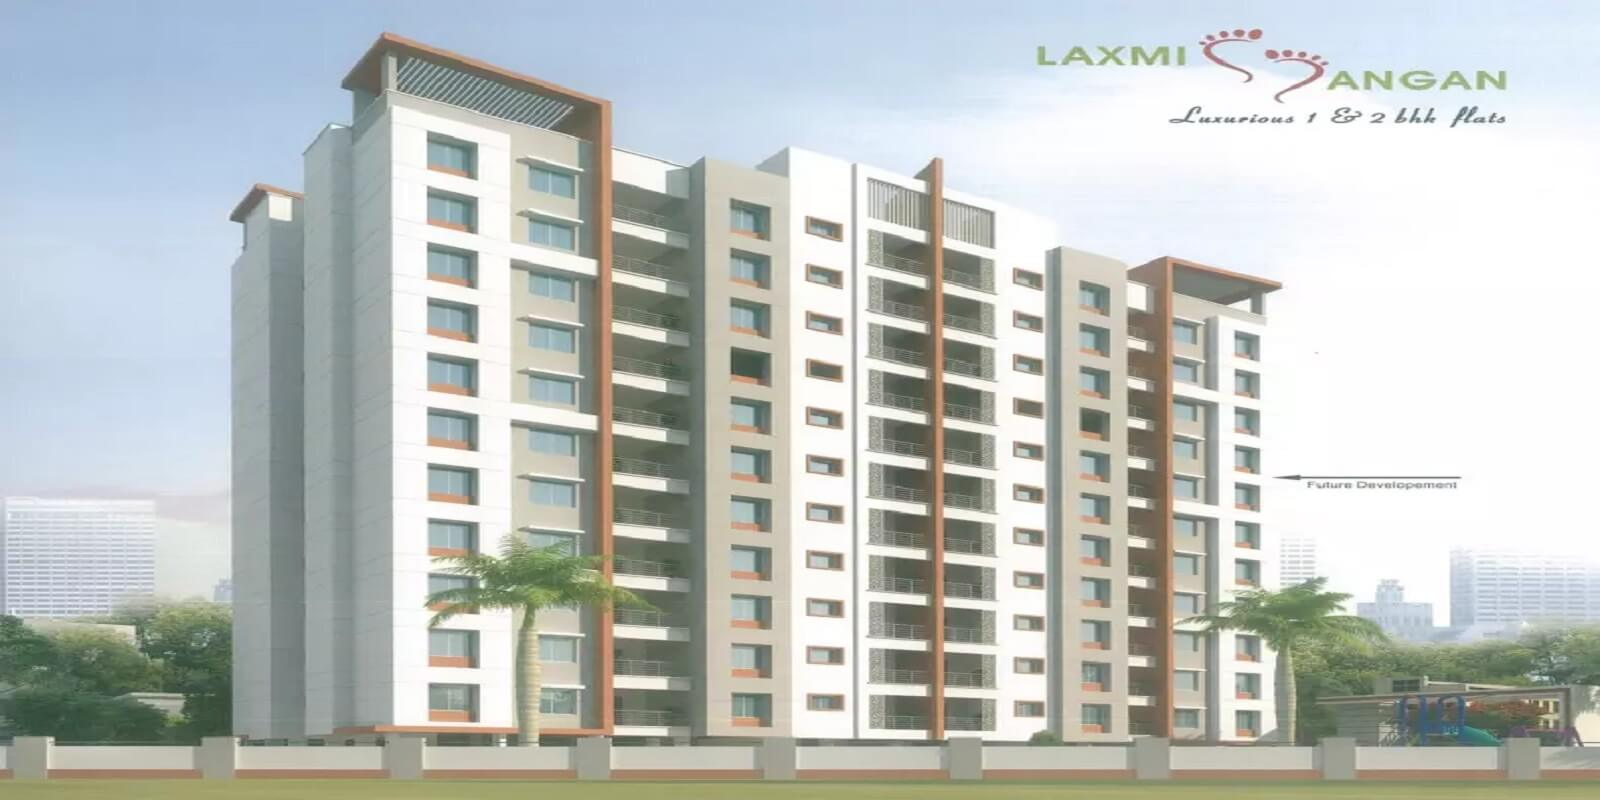 ashish laxmi angan project large image1